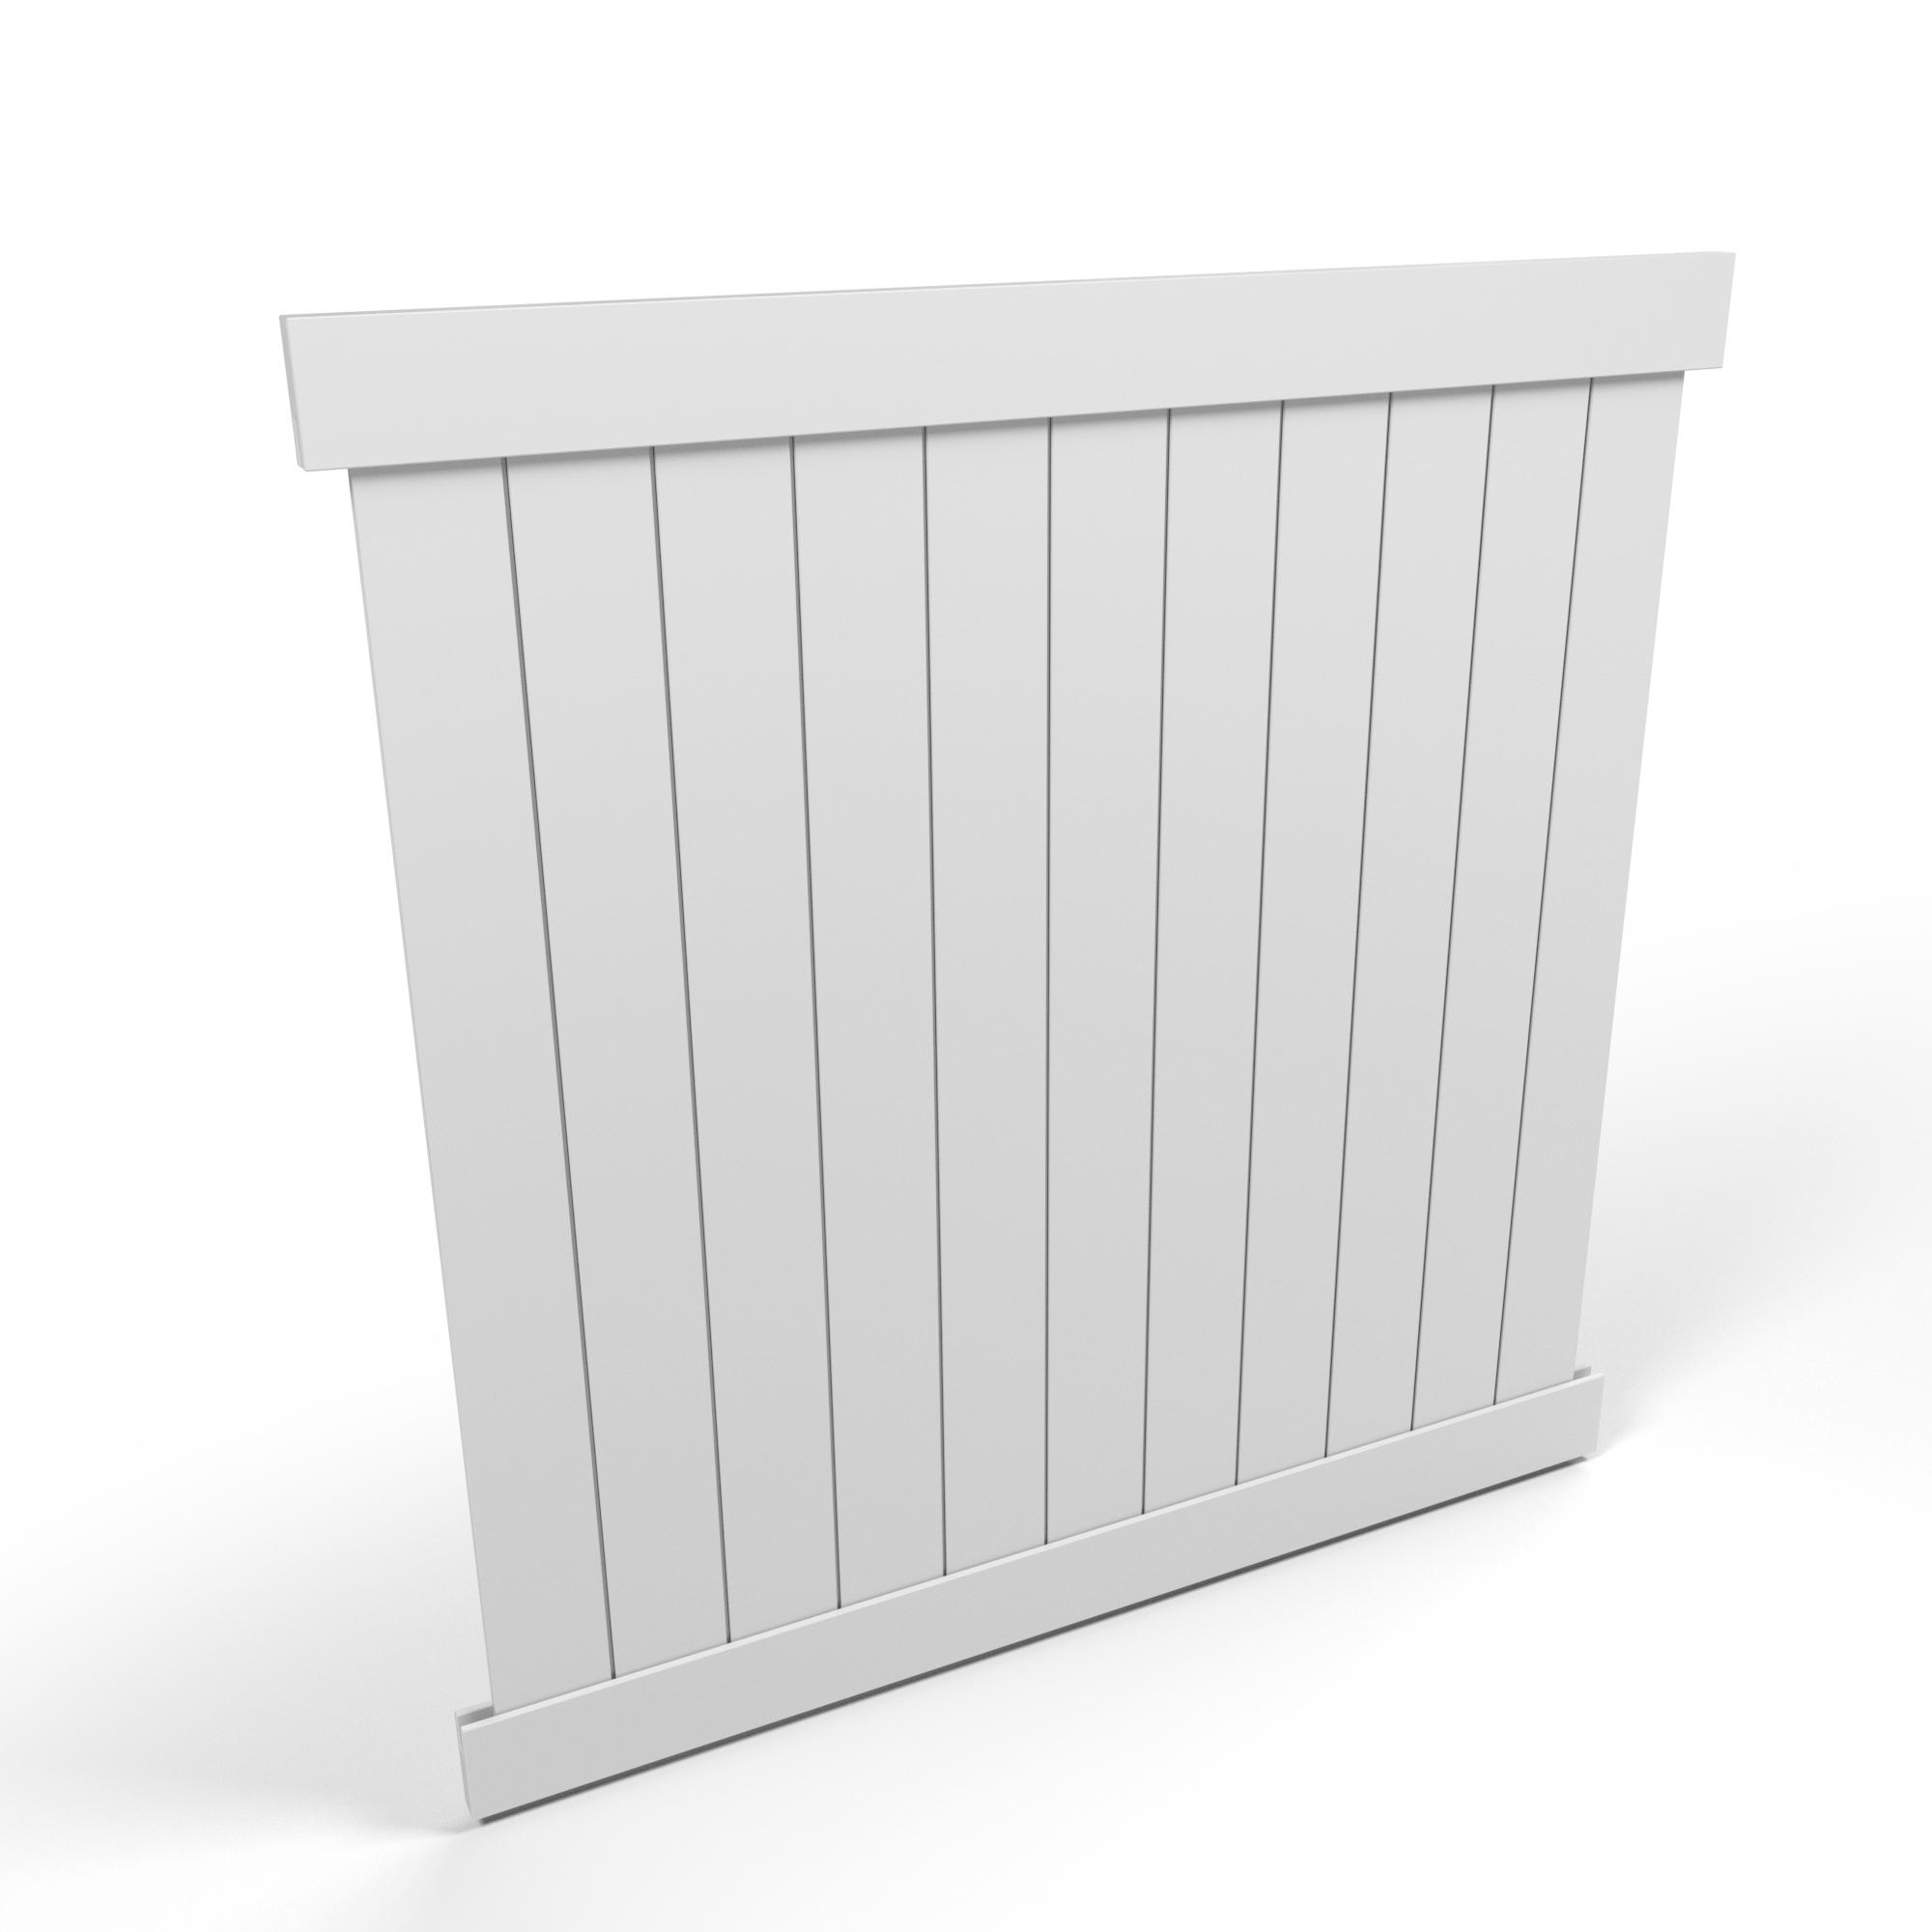 Vinyl Privacy Fence Panel